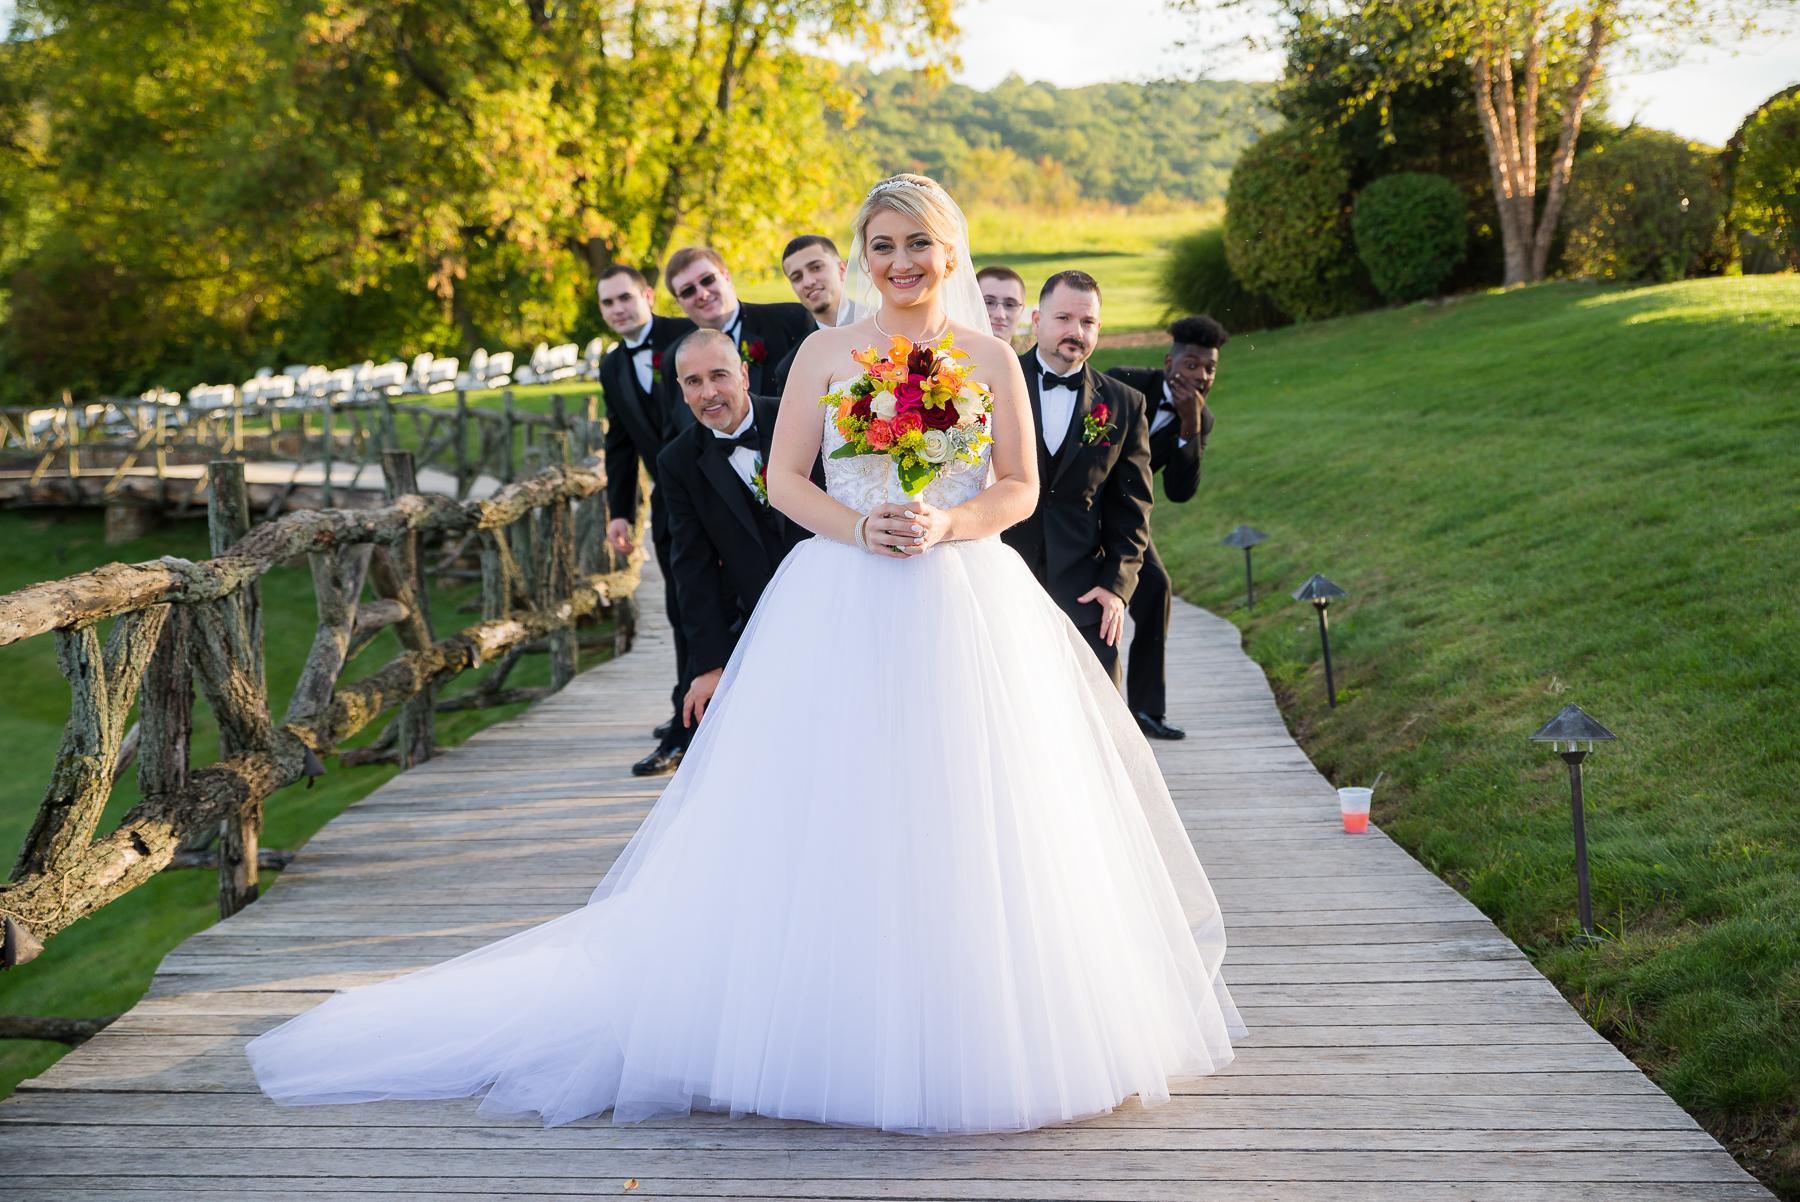 Kim-Ray-Wedding-Garcia-Photography-8864.jpg